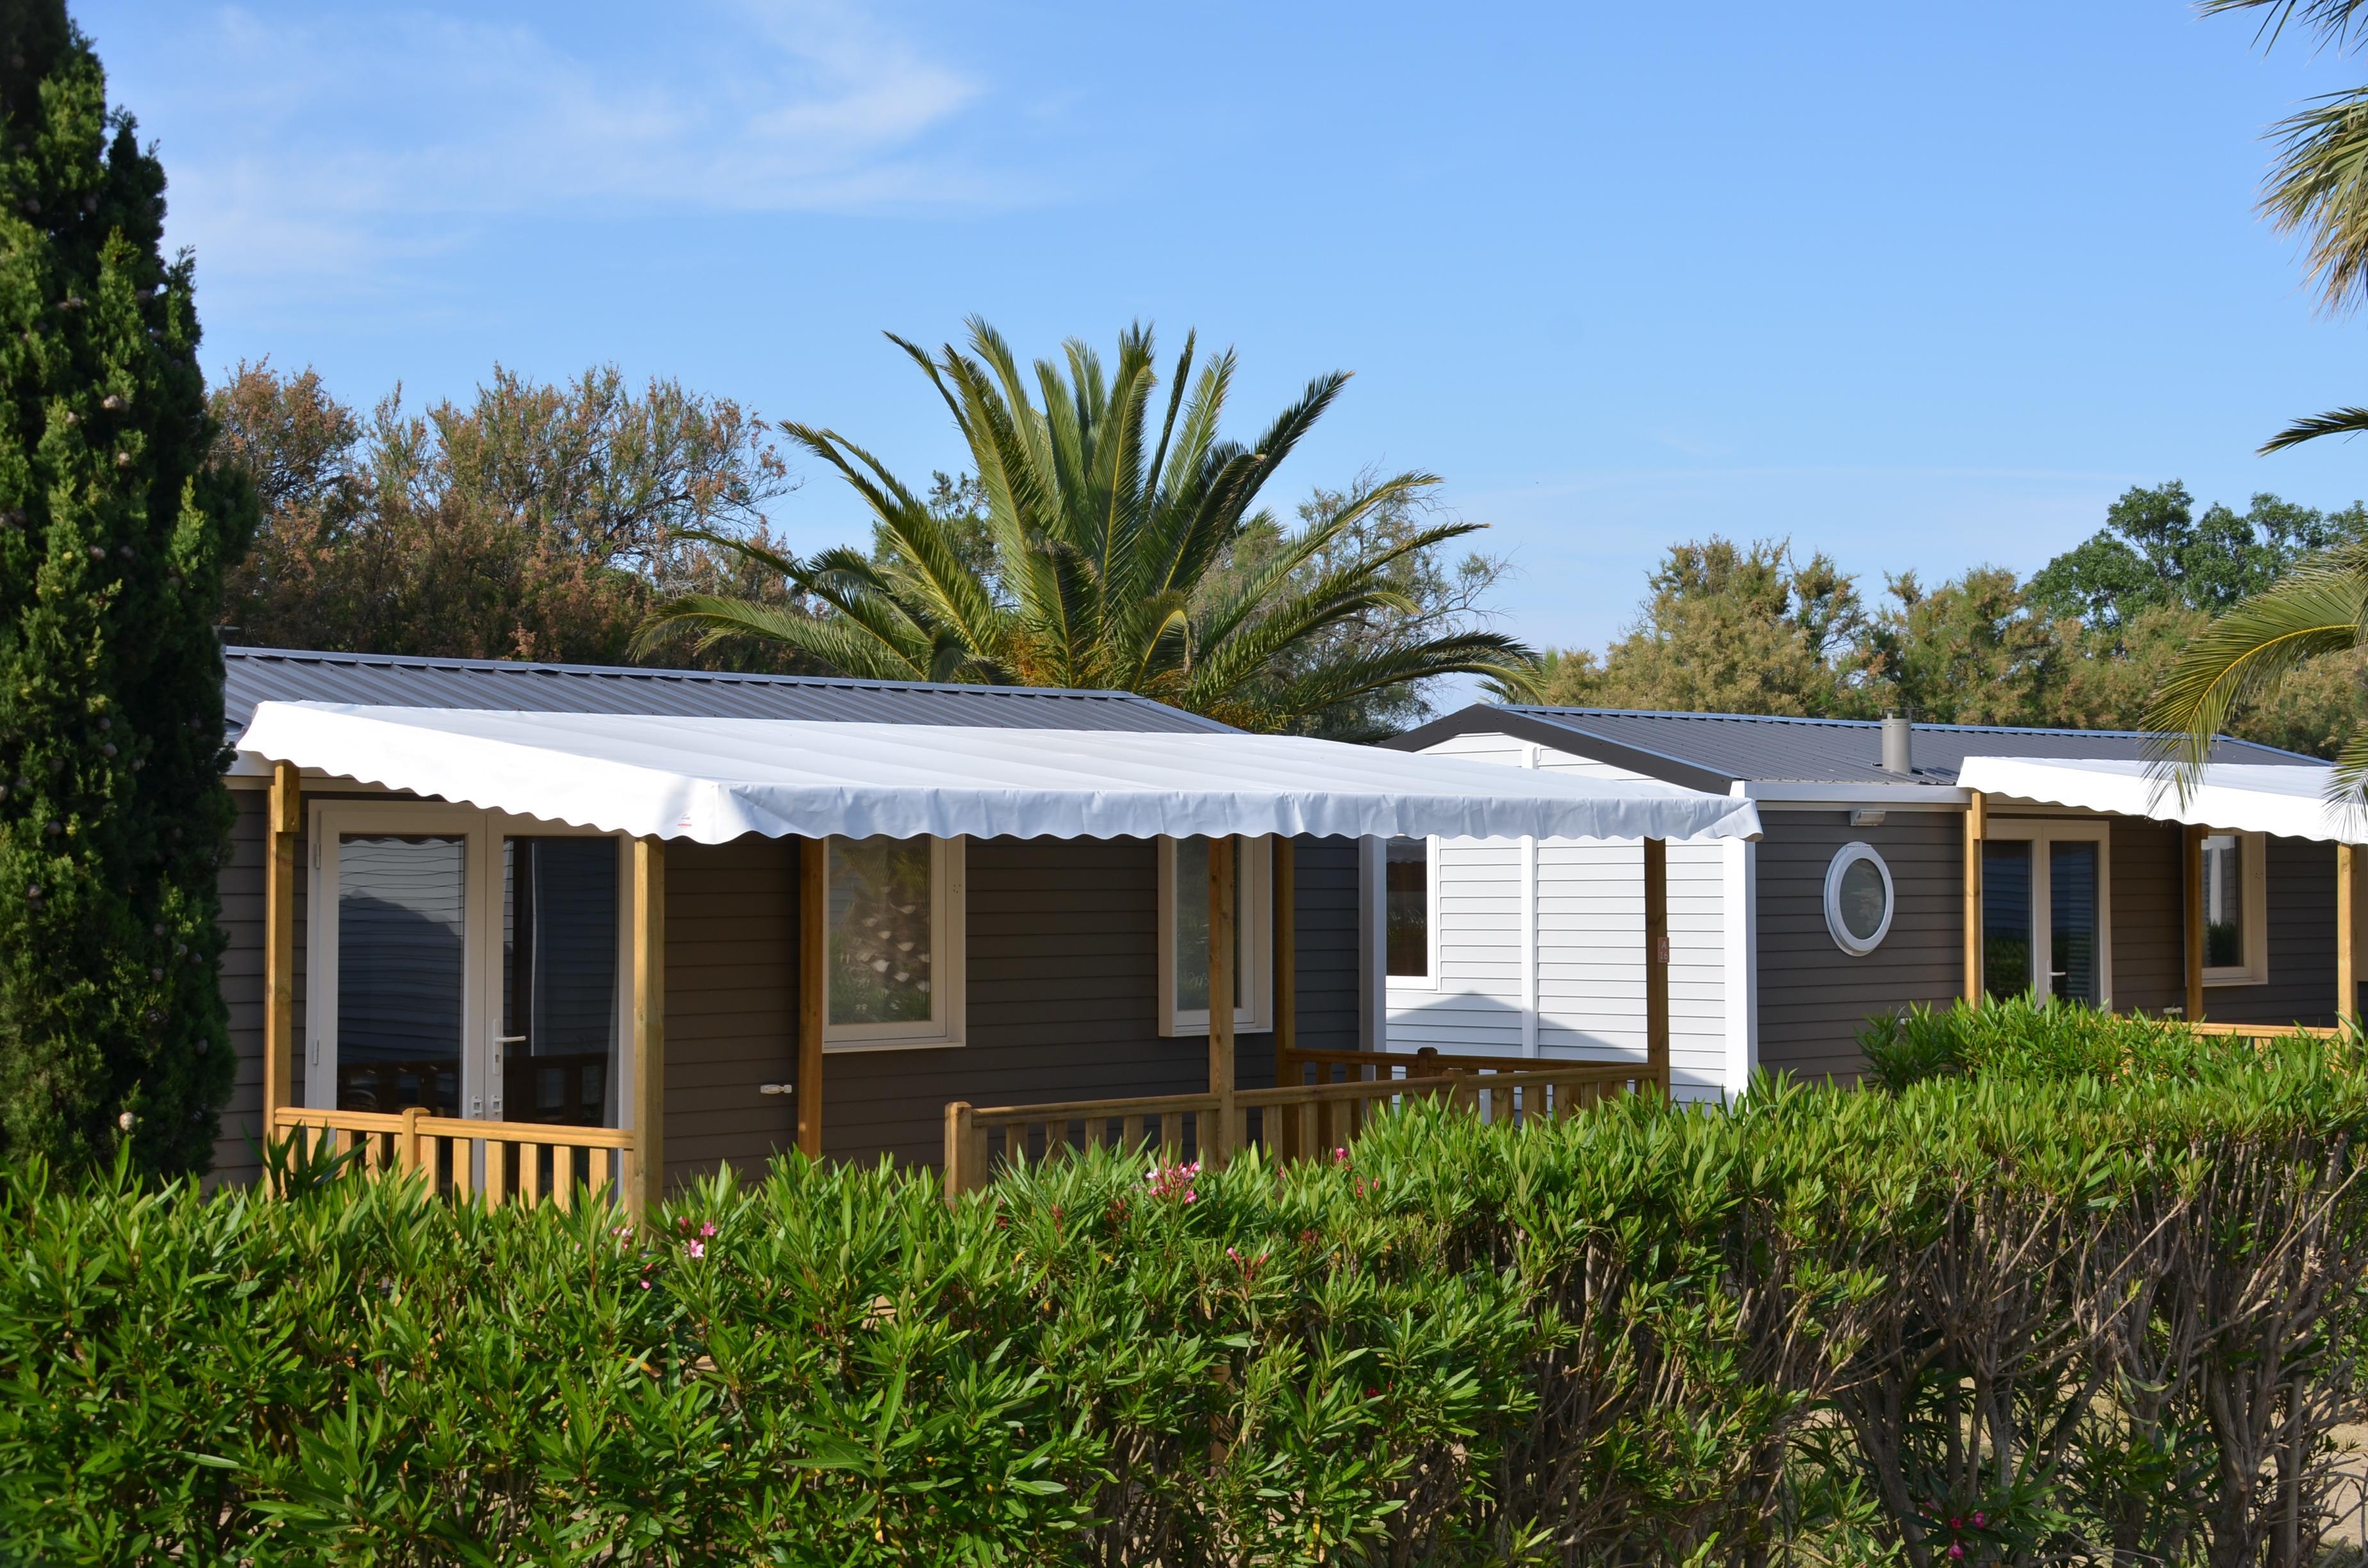 Location - Cottage Tamarin **** 3 Chambres + 1 Salle De Bain + Clim / 35M² - Yelloh! Village Les Tropiques